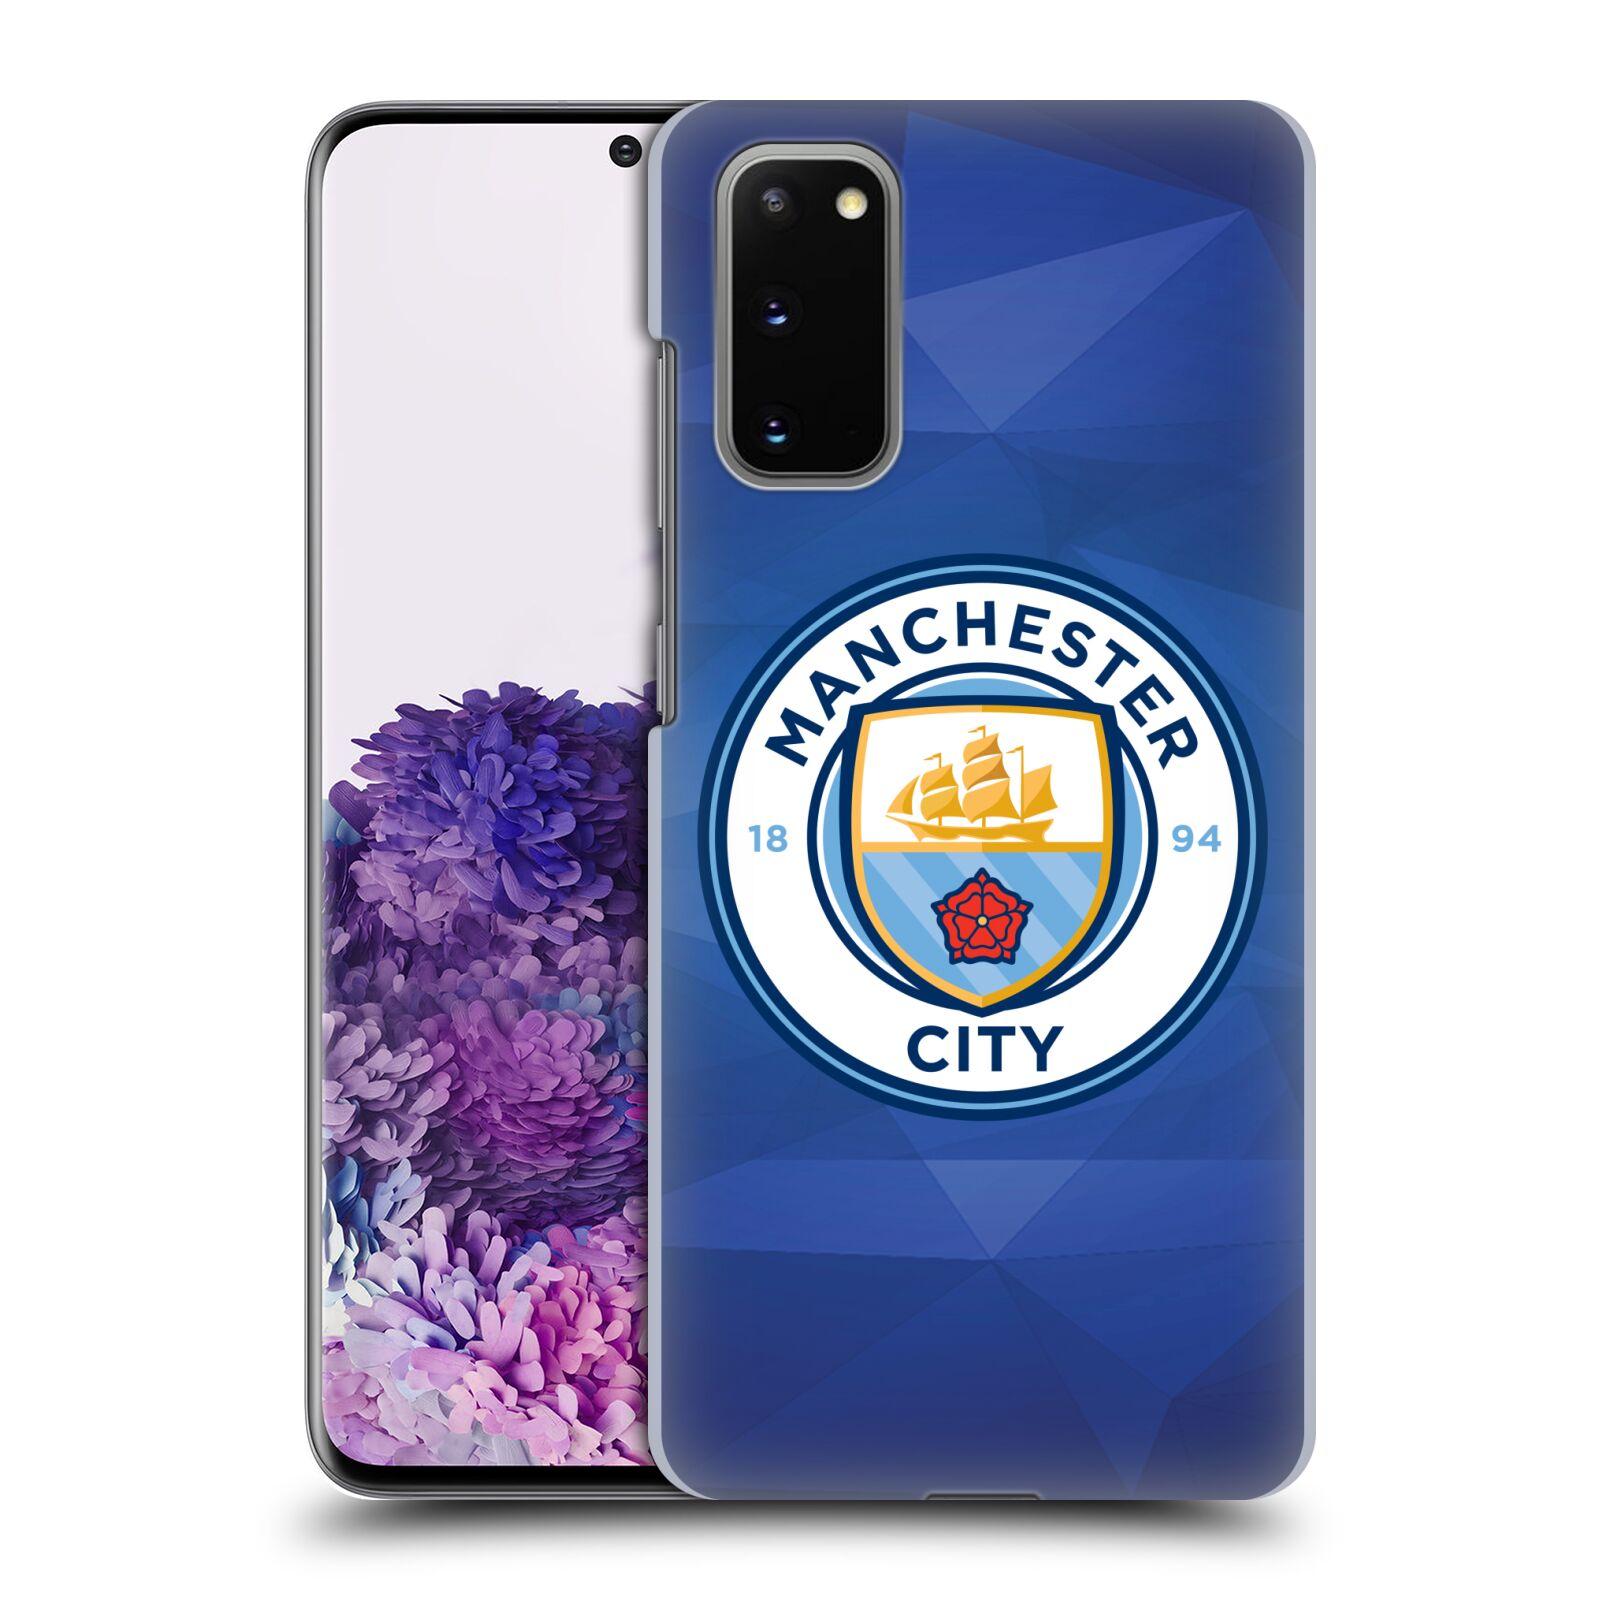 Plastové pouzdro na mobil Samsung Galaxy S20 - Head Case - Manchester City FC - Modré nové logo